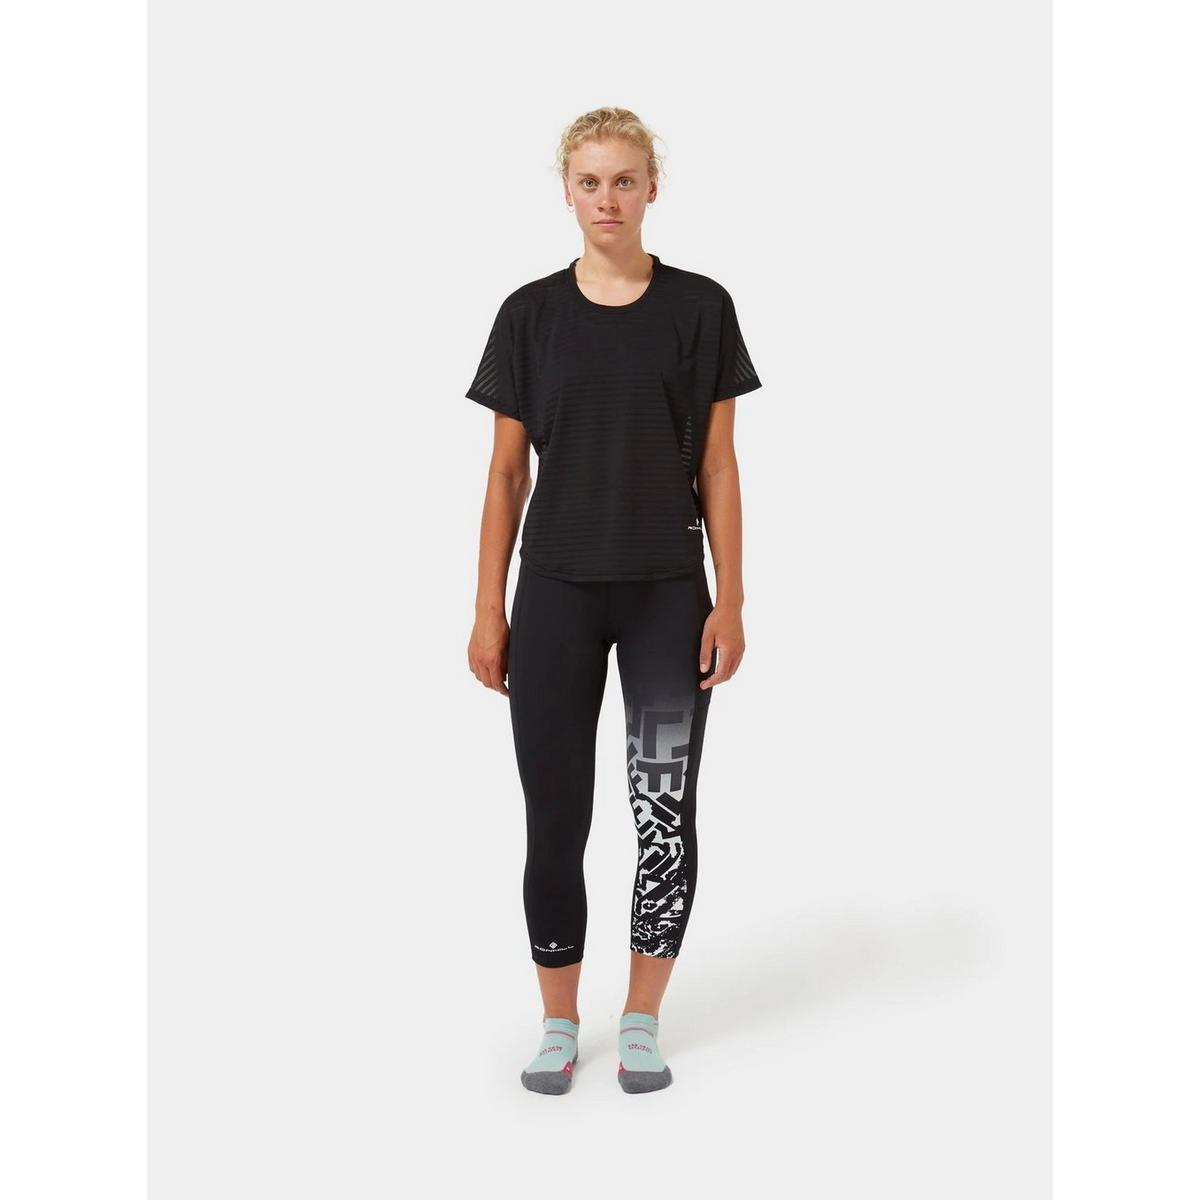 Ron Hill Women's Life Agile S/S T-Shirt - Black